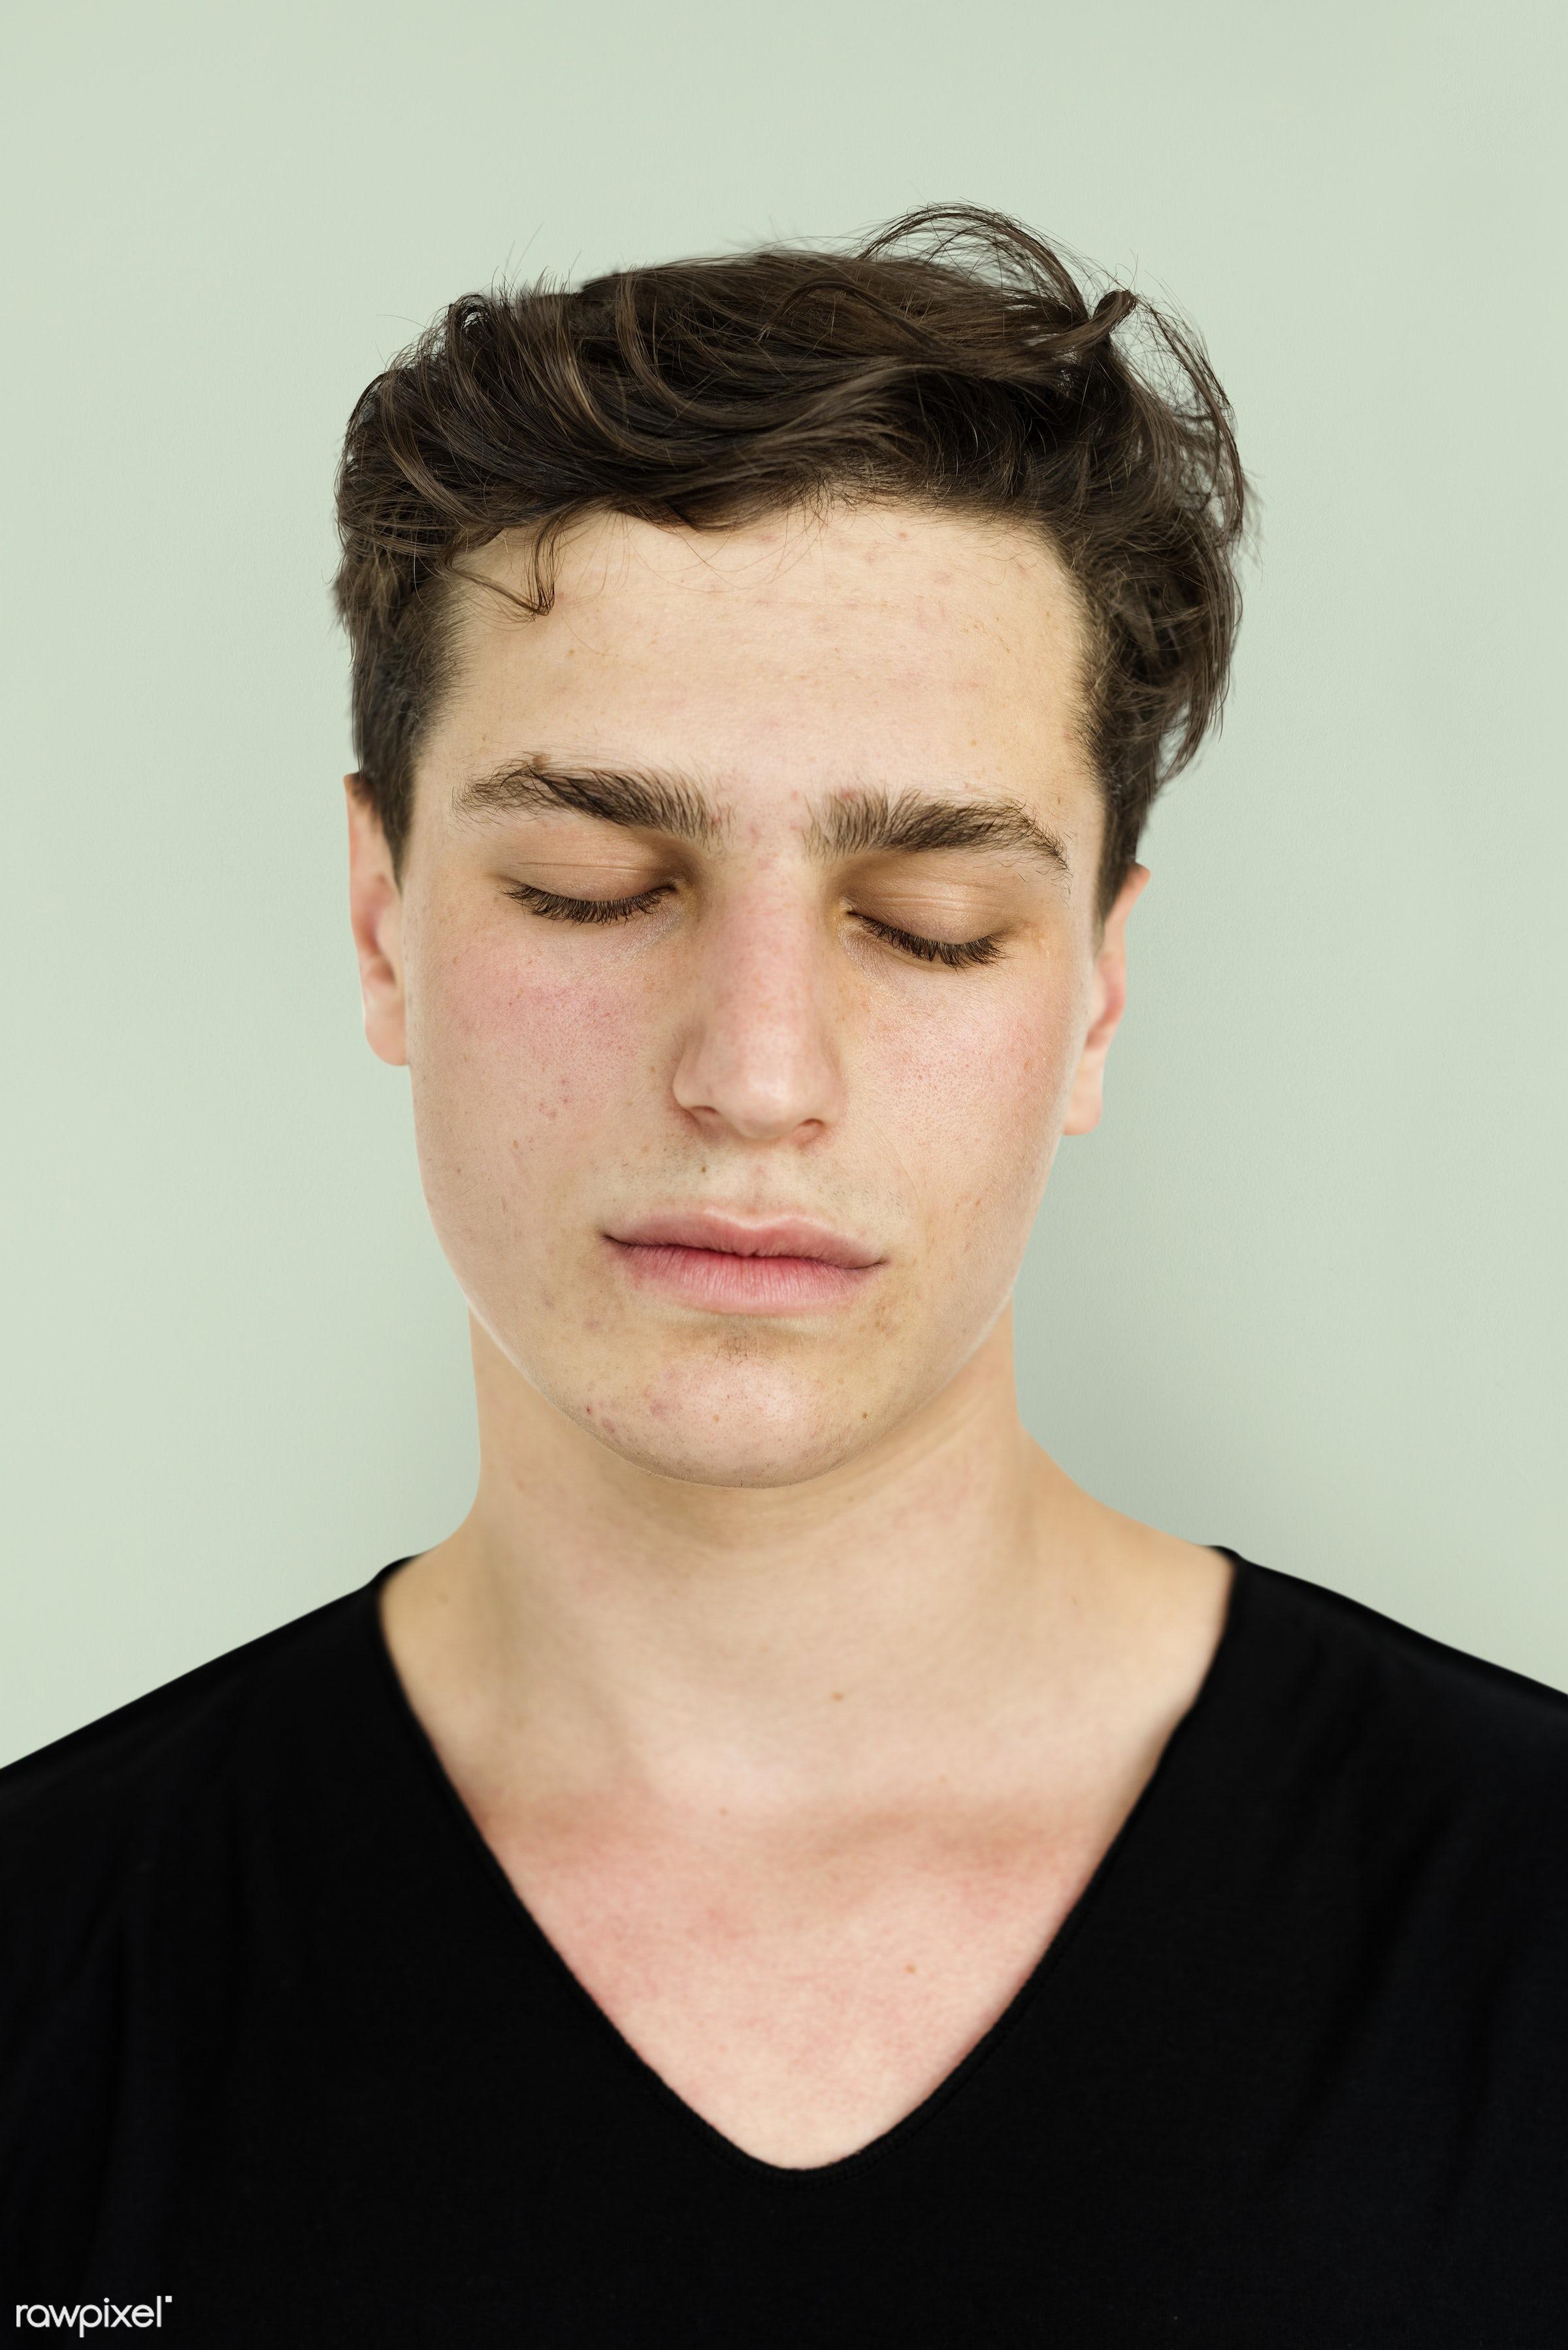 alone, boy, closed eyes, emotion, expression, face, isolated, isolated on white, man, one, portrait, studio, white...